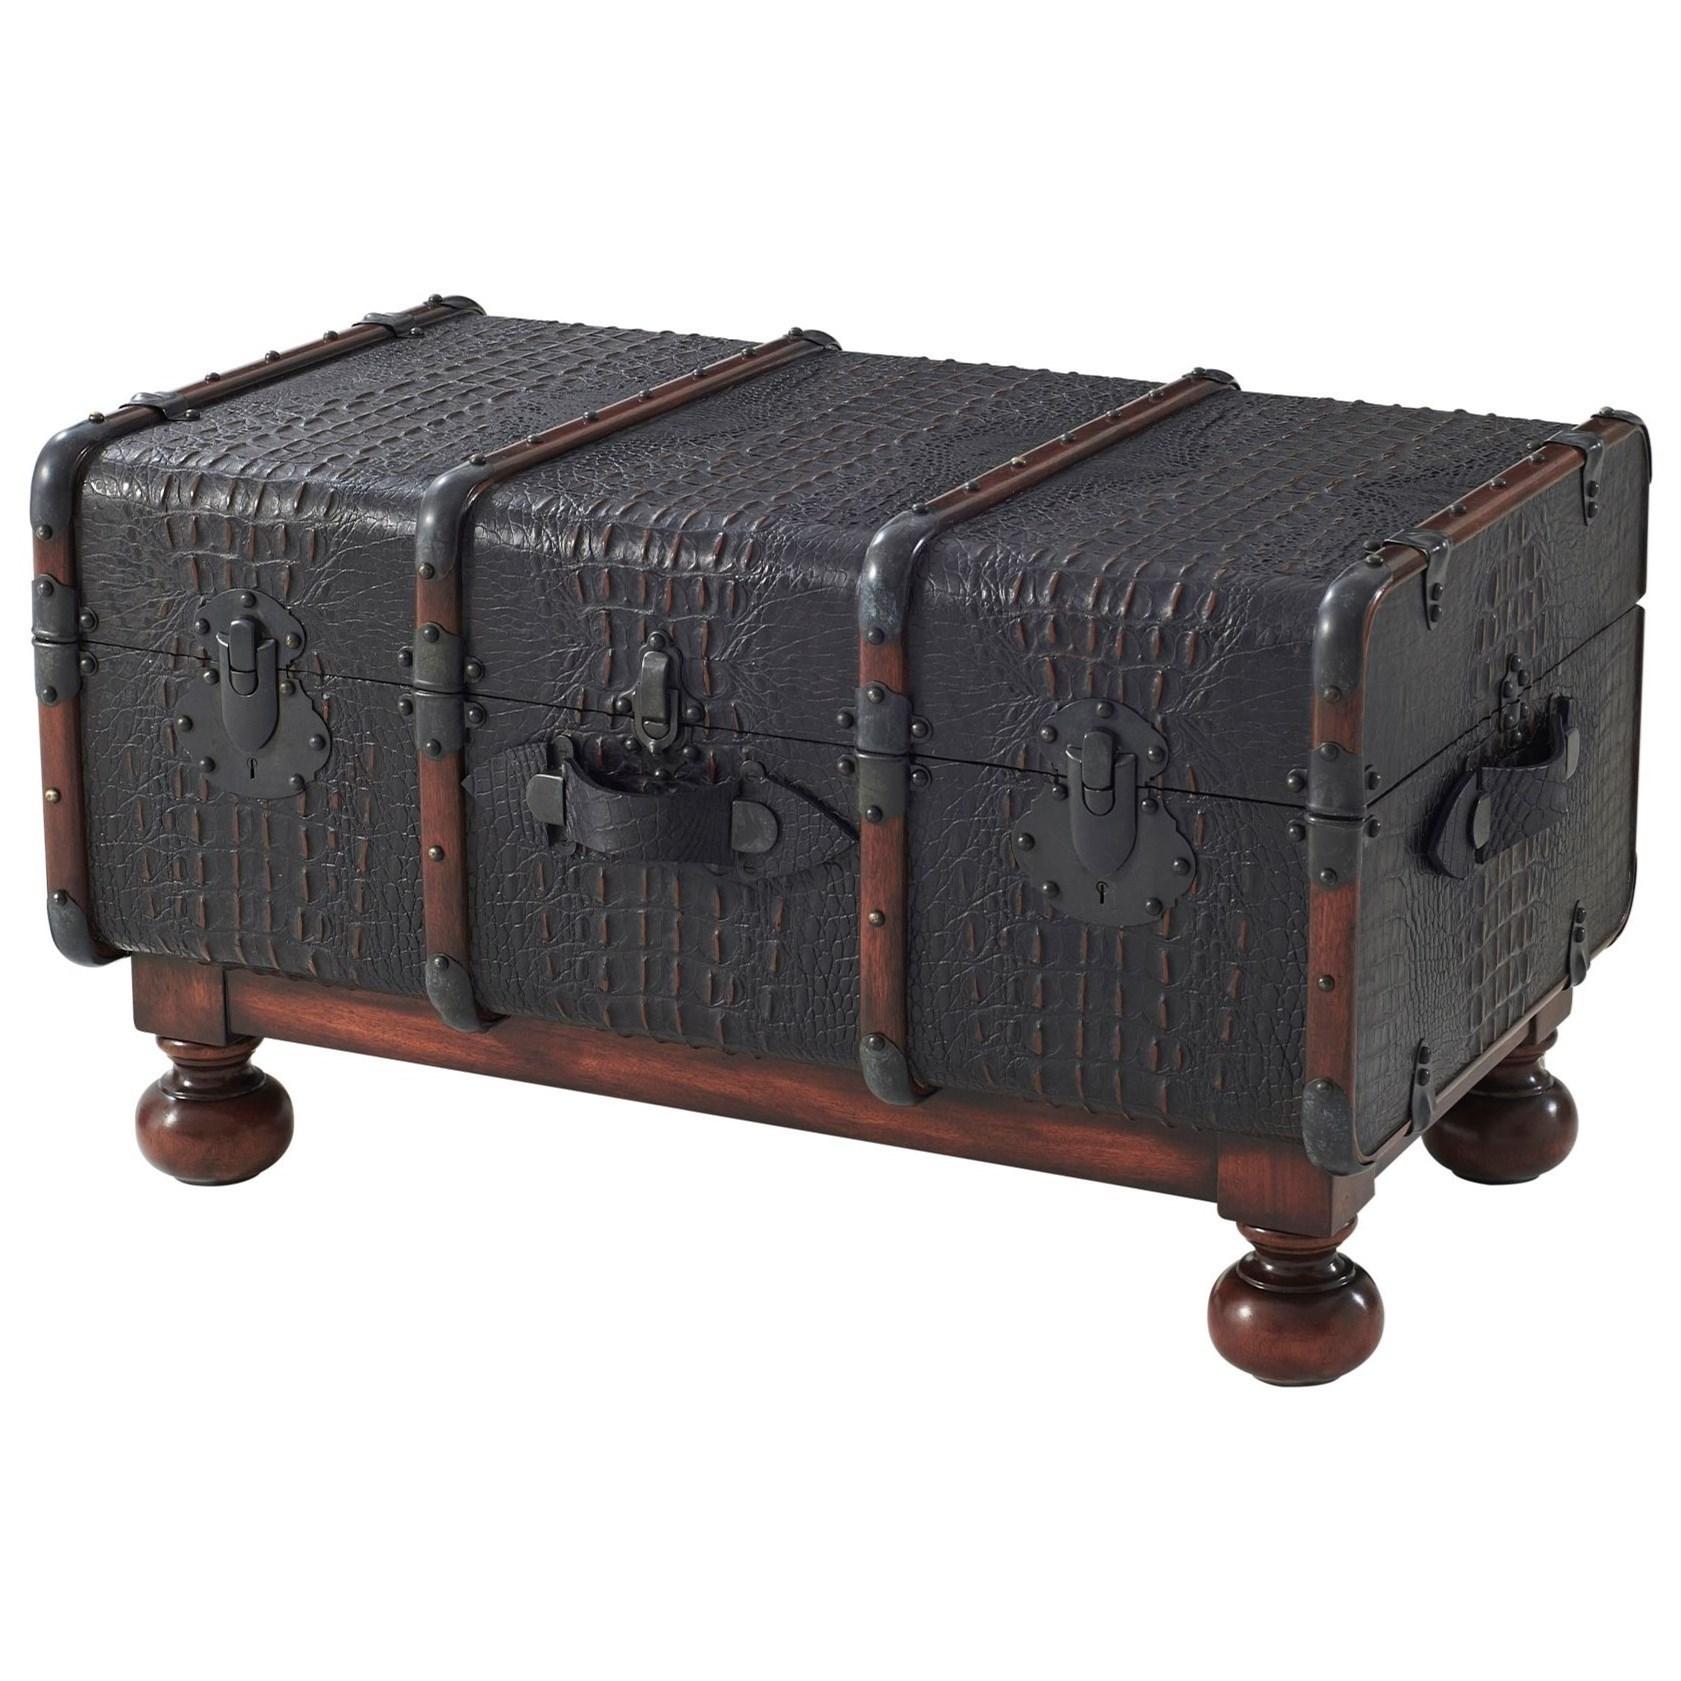 Kalahari The Kalahari Steamer Trunk by Theodore Alexander at Baer's Furniture